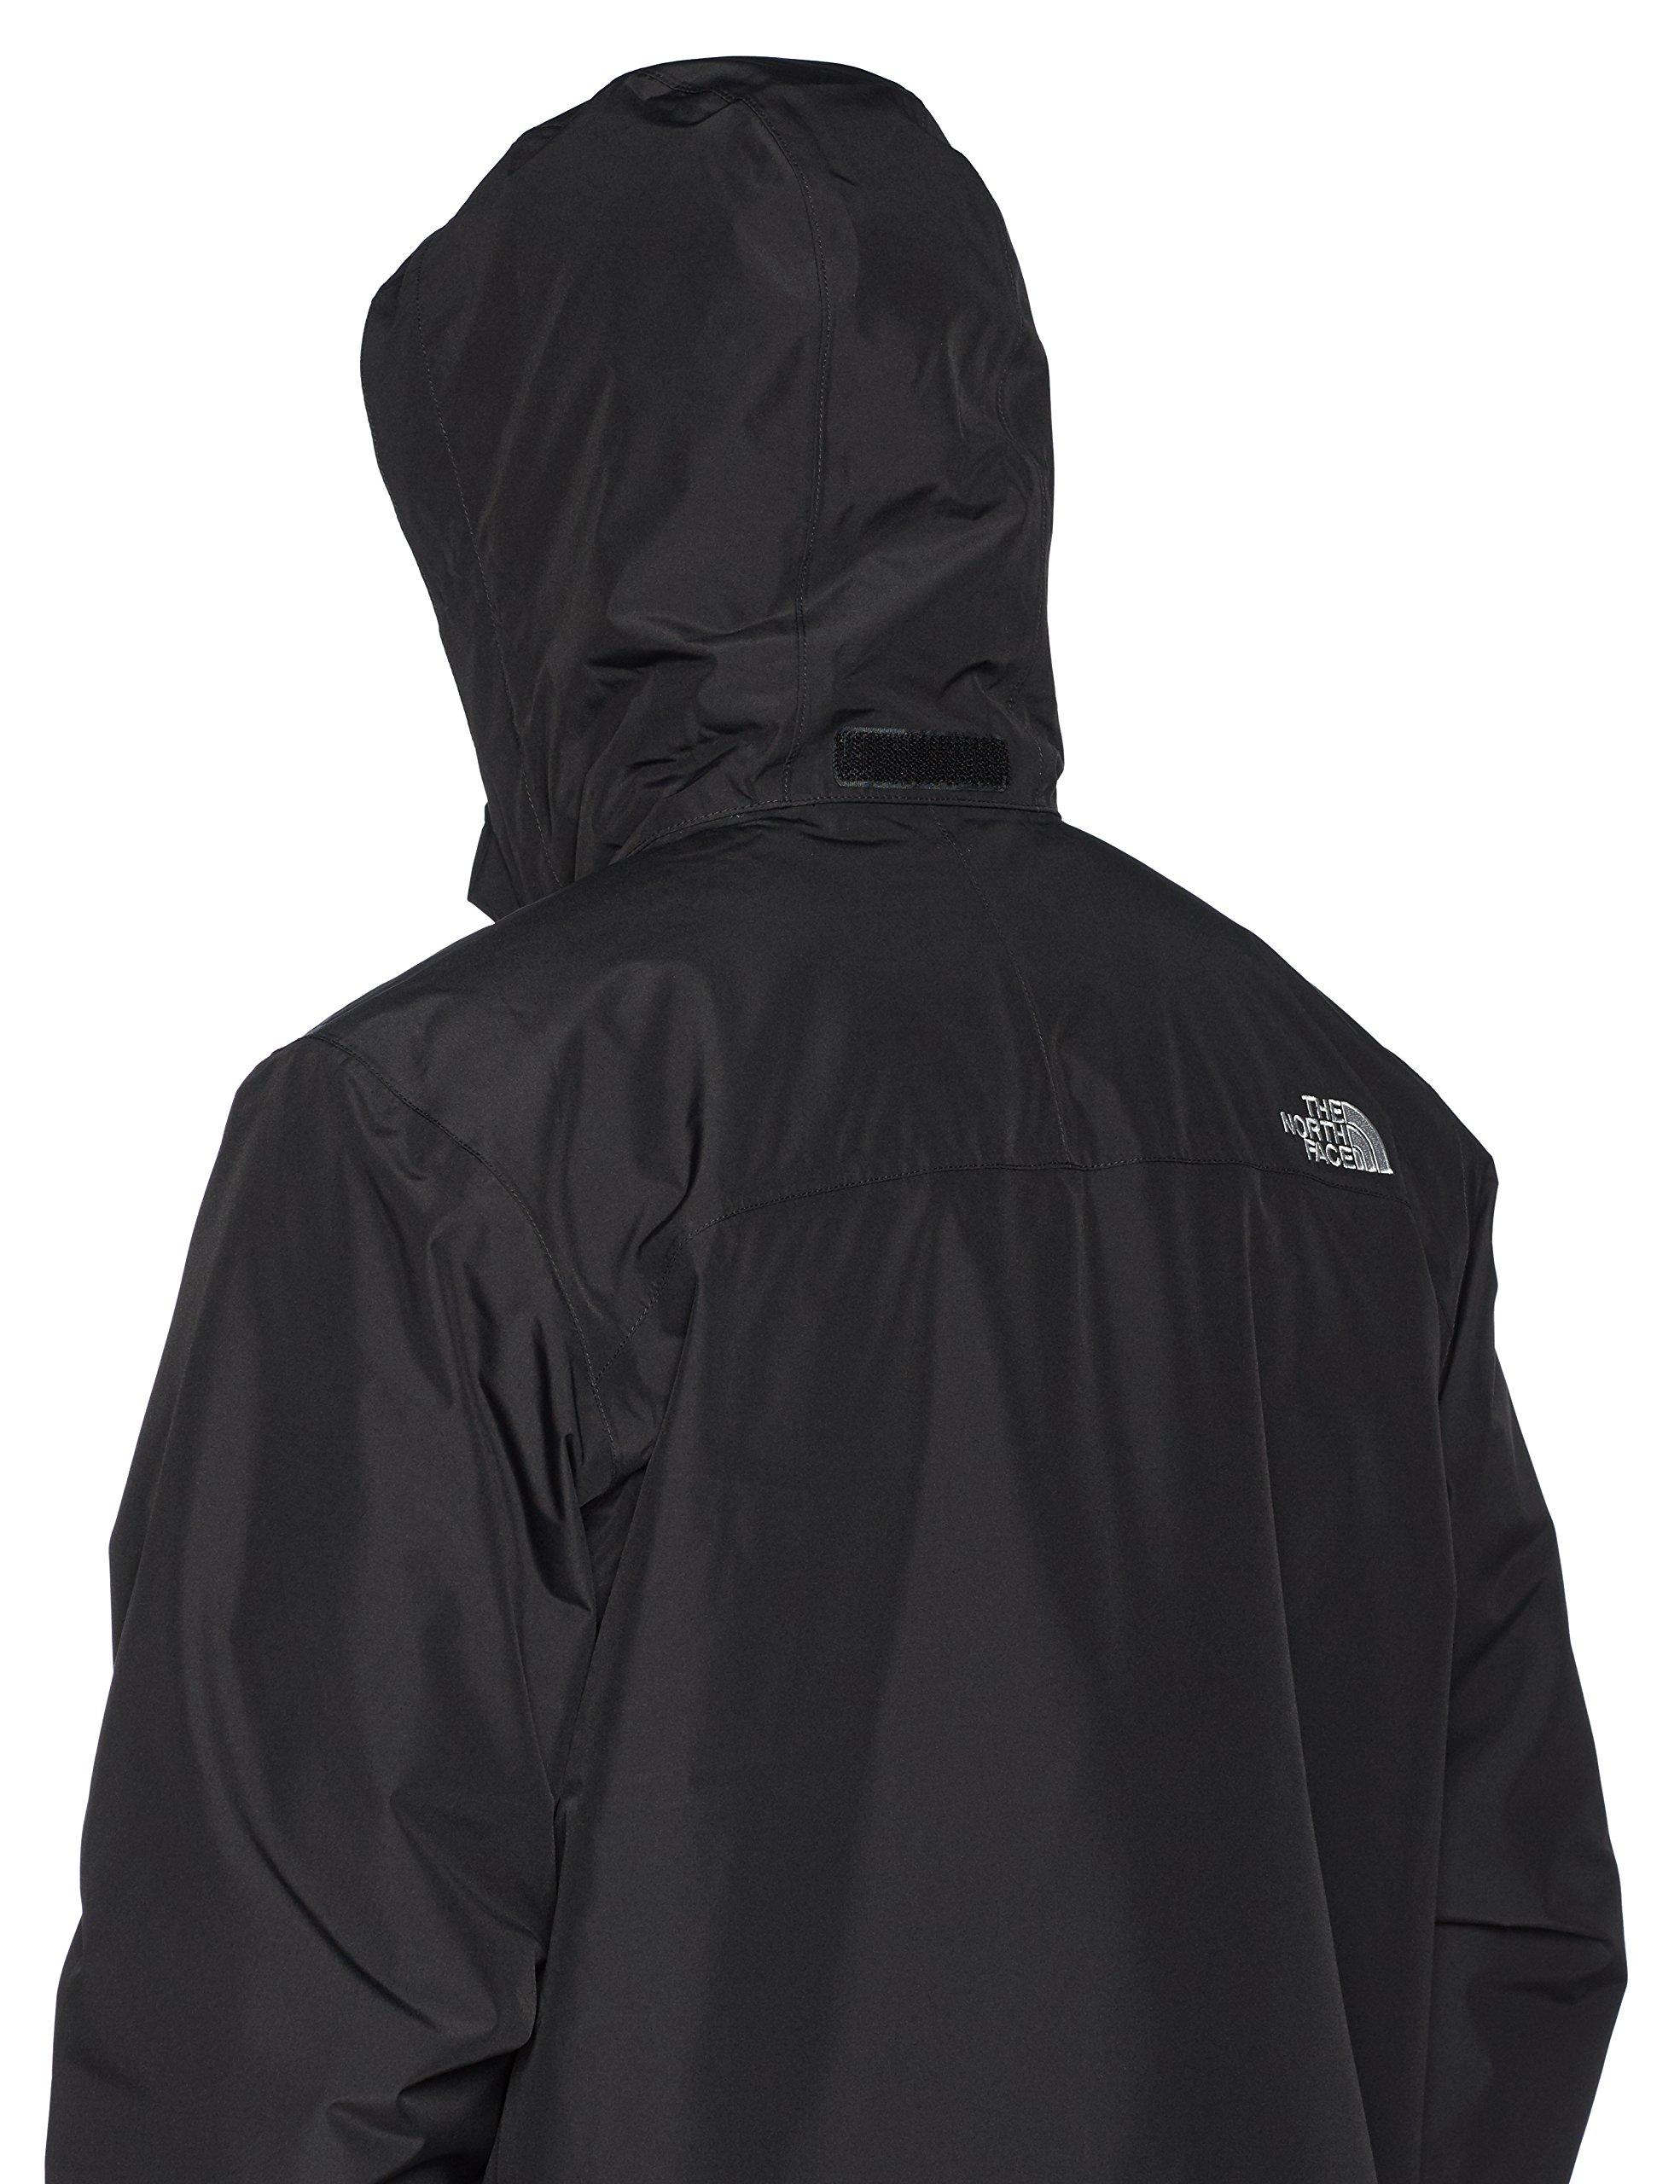 81jHm CXCEL - The North Face Waterproof Resolve Men's Outdoor Hooded Jacket